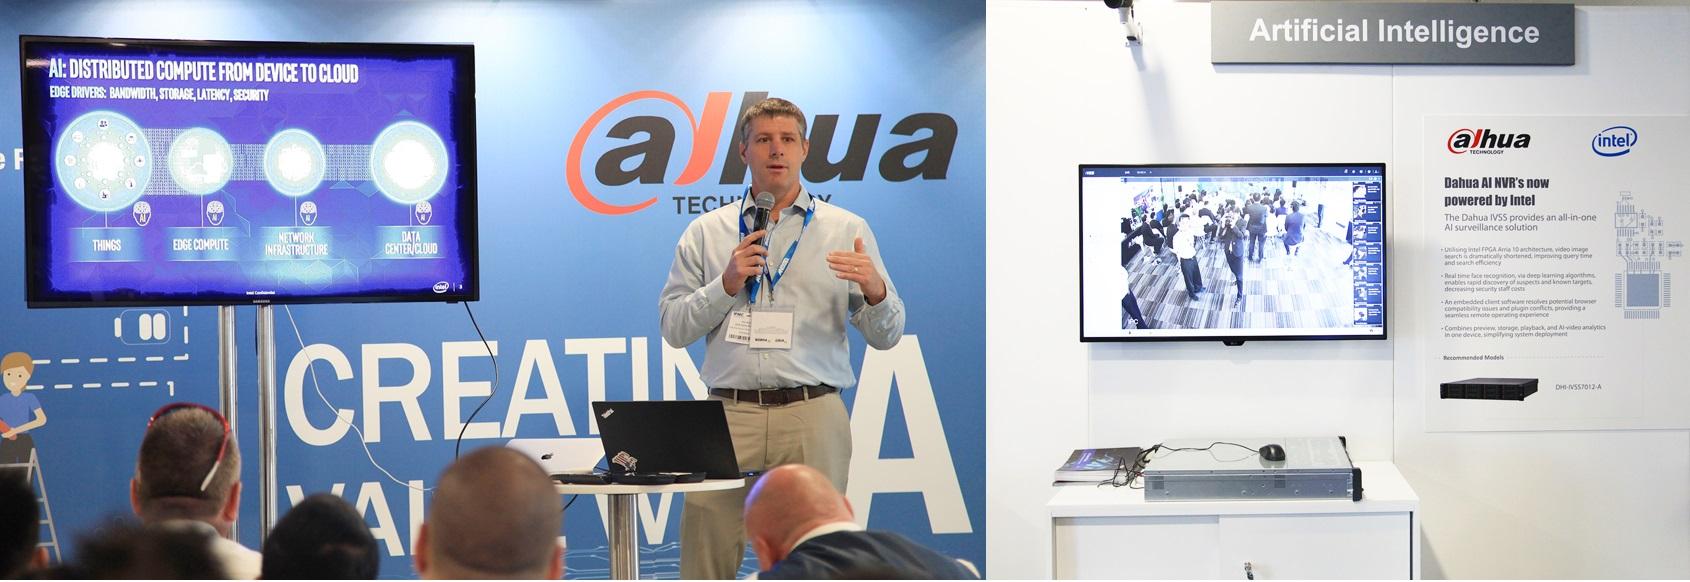 Dahua Technology presents FPGA in AI with Intel